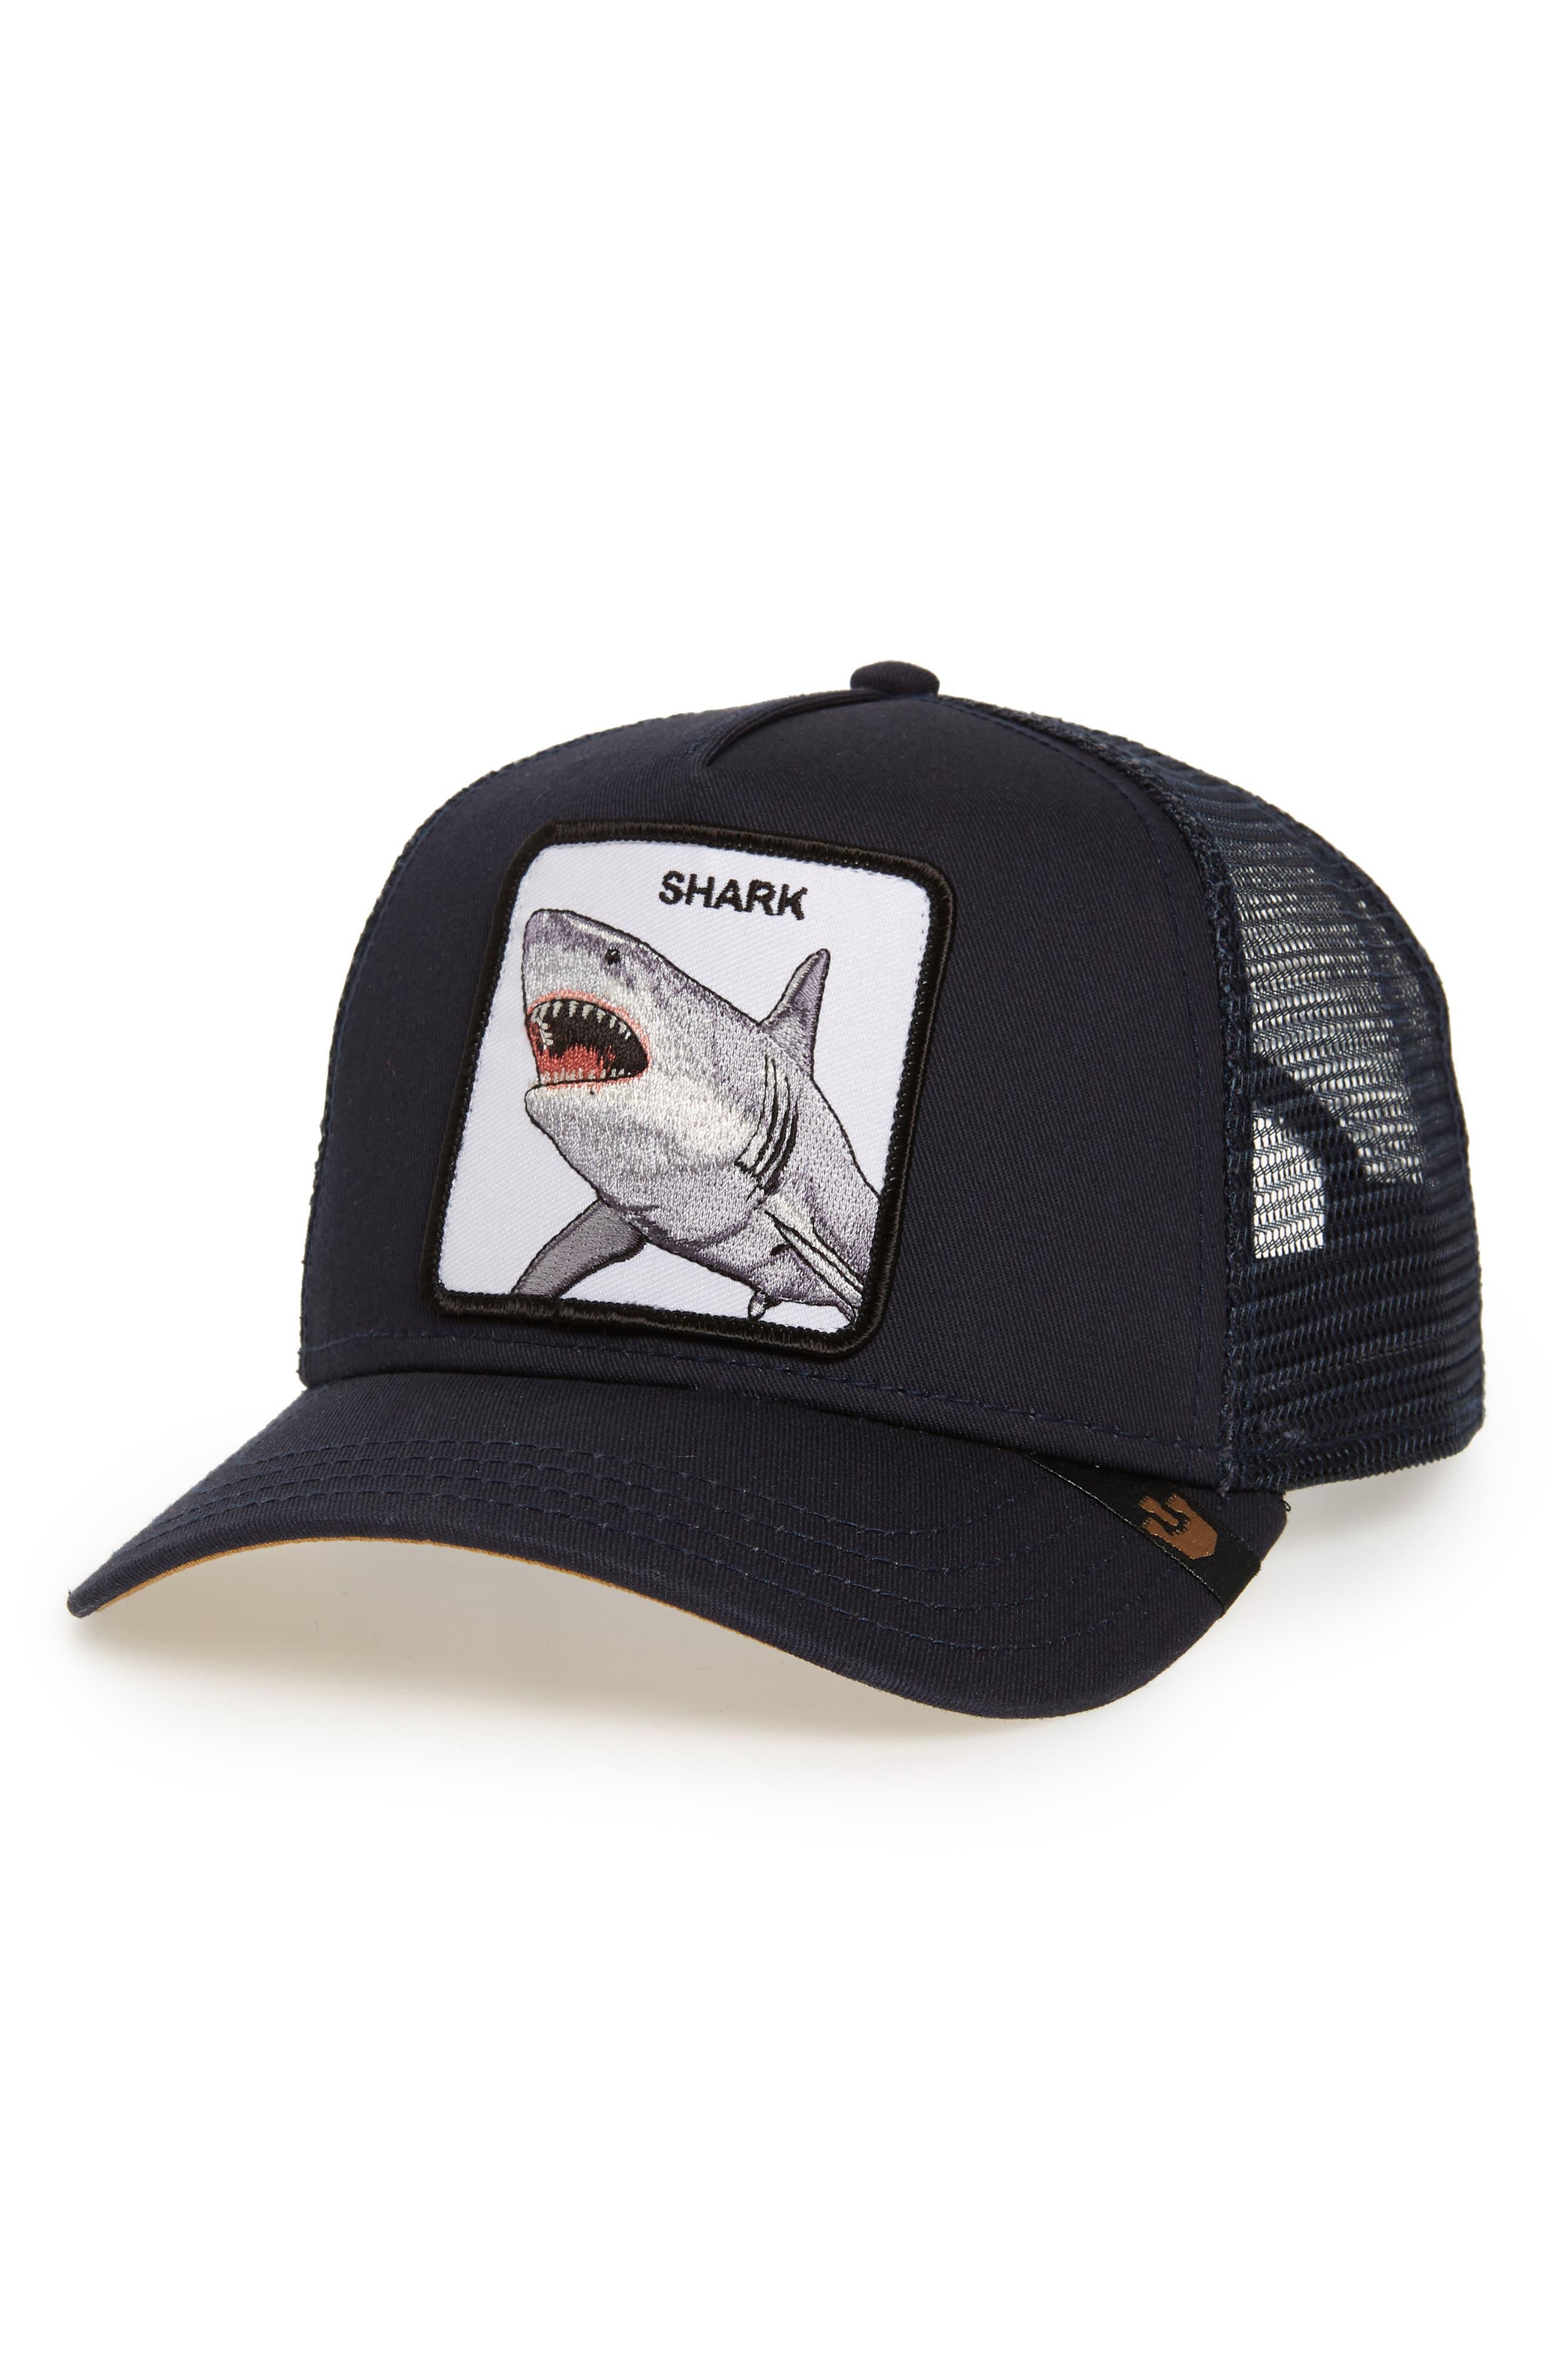 40bae47e3dc Men's Hats, Hats for Men | Nordstrom